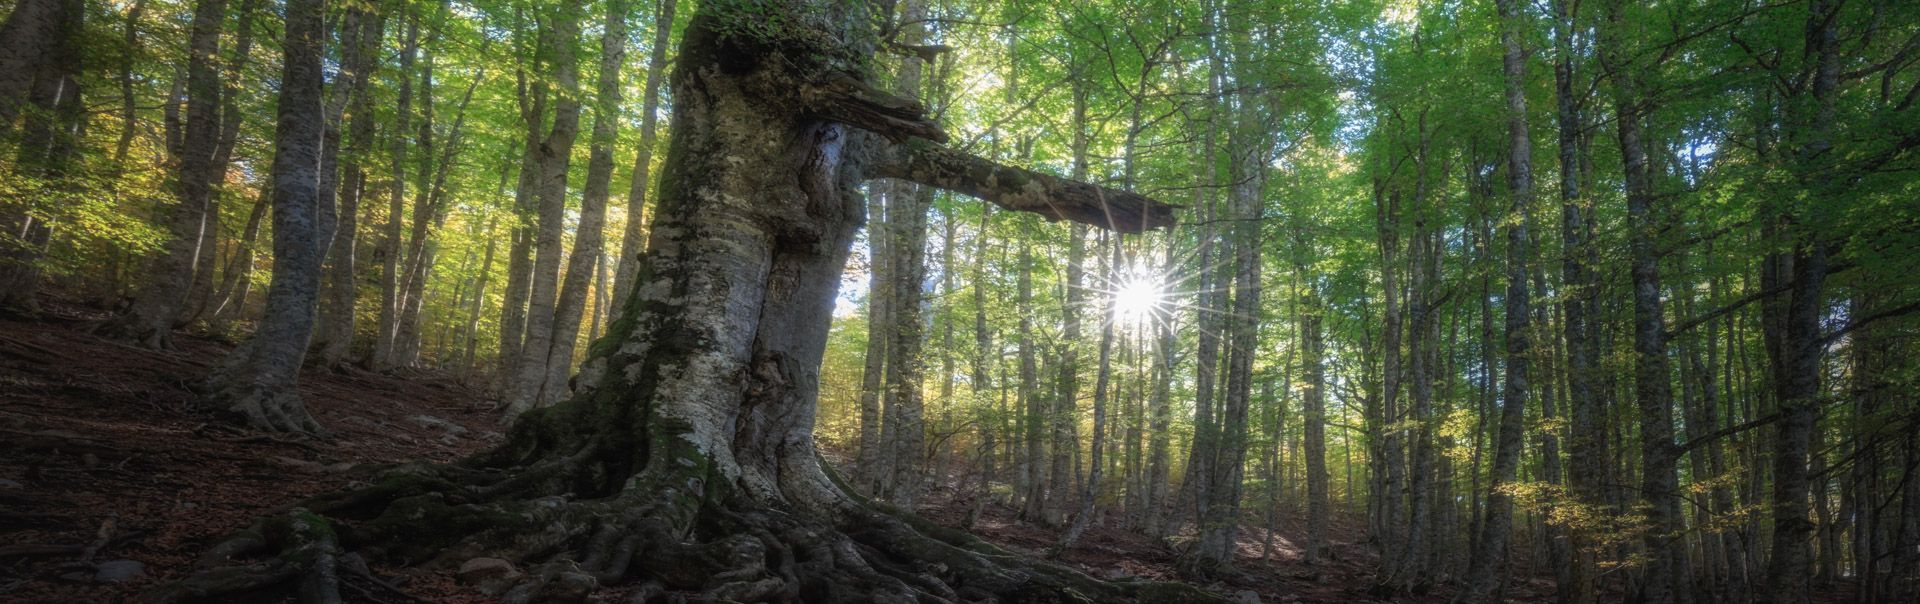 Cozzo Ferriero beech forest